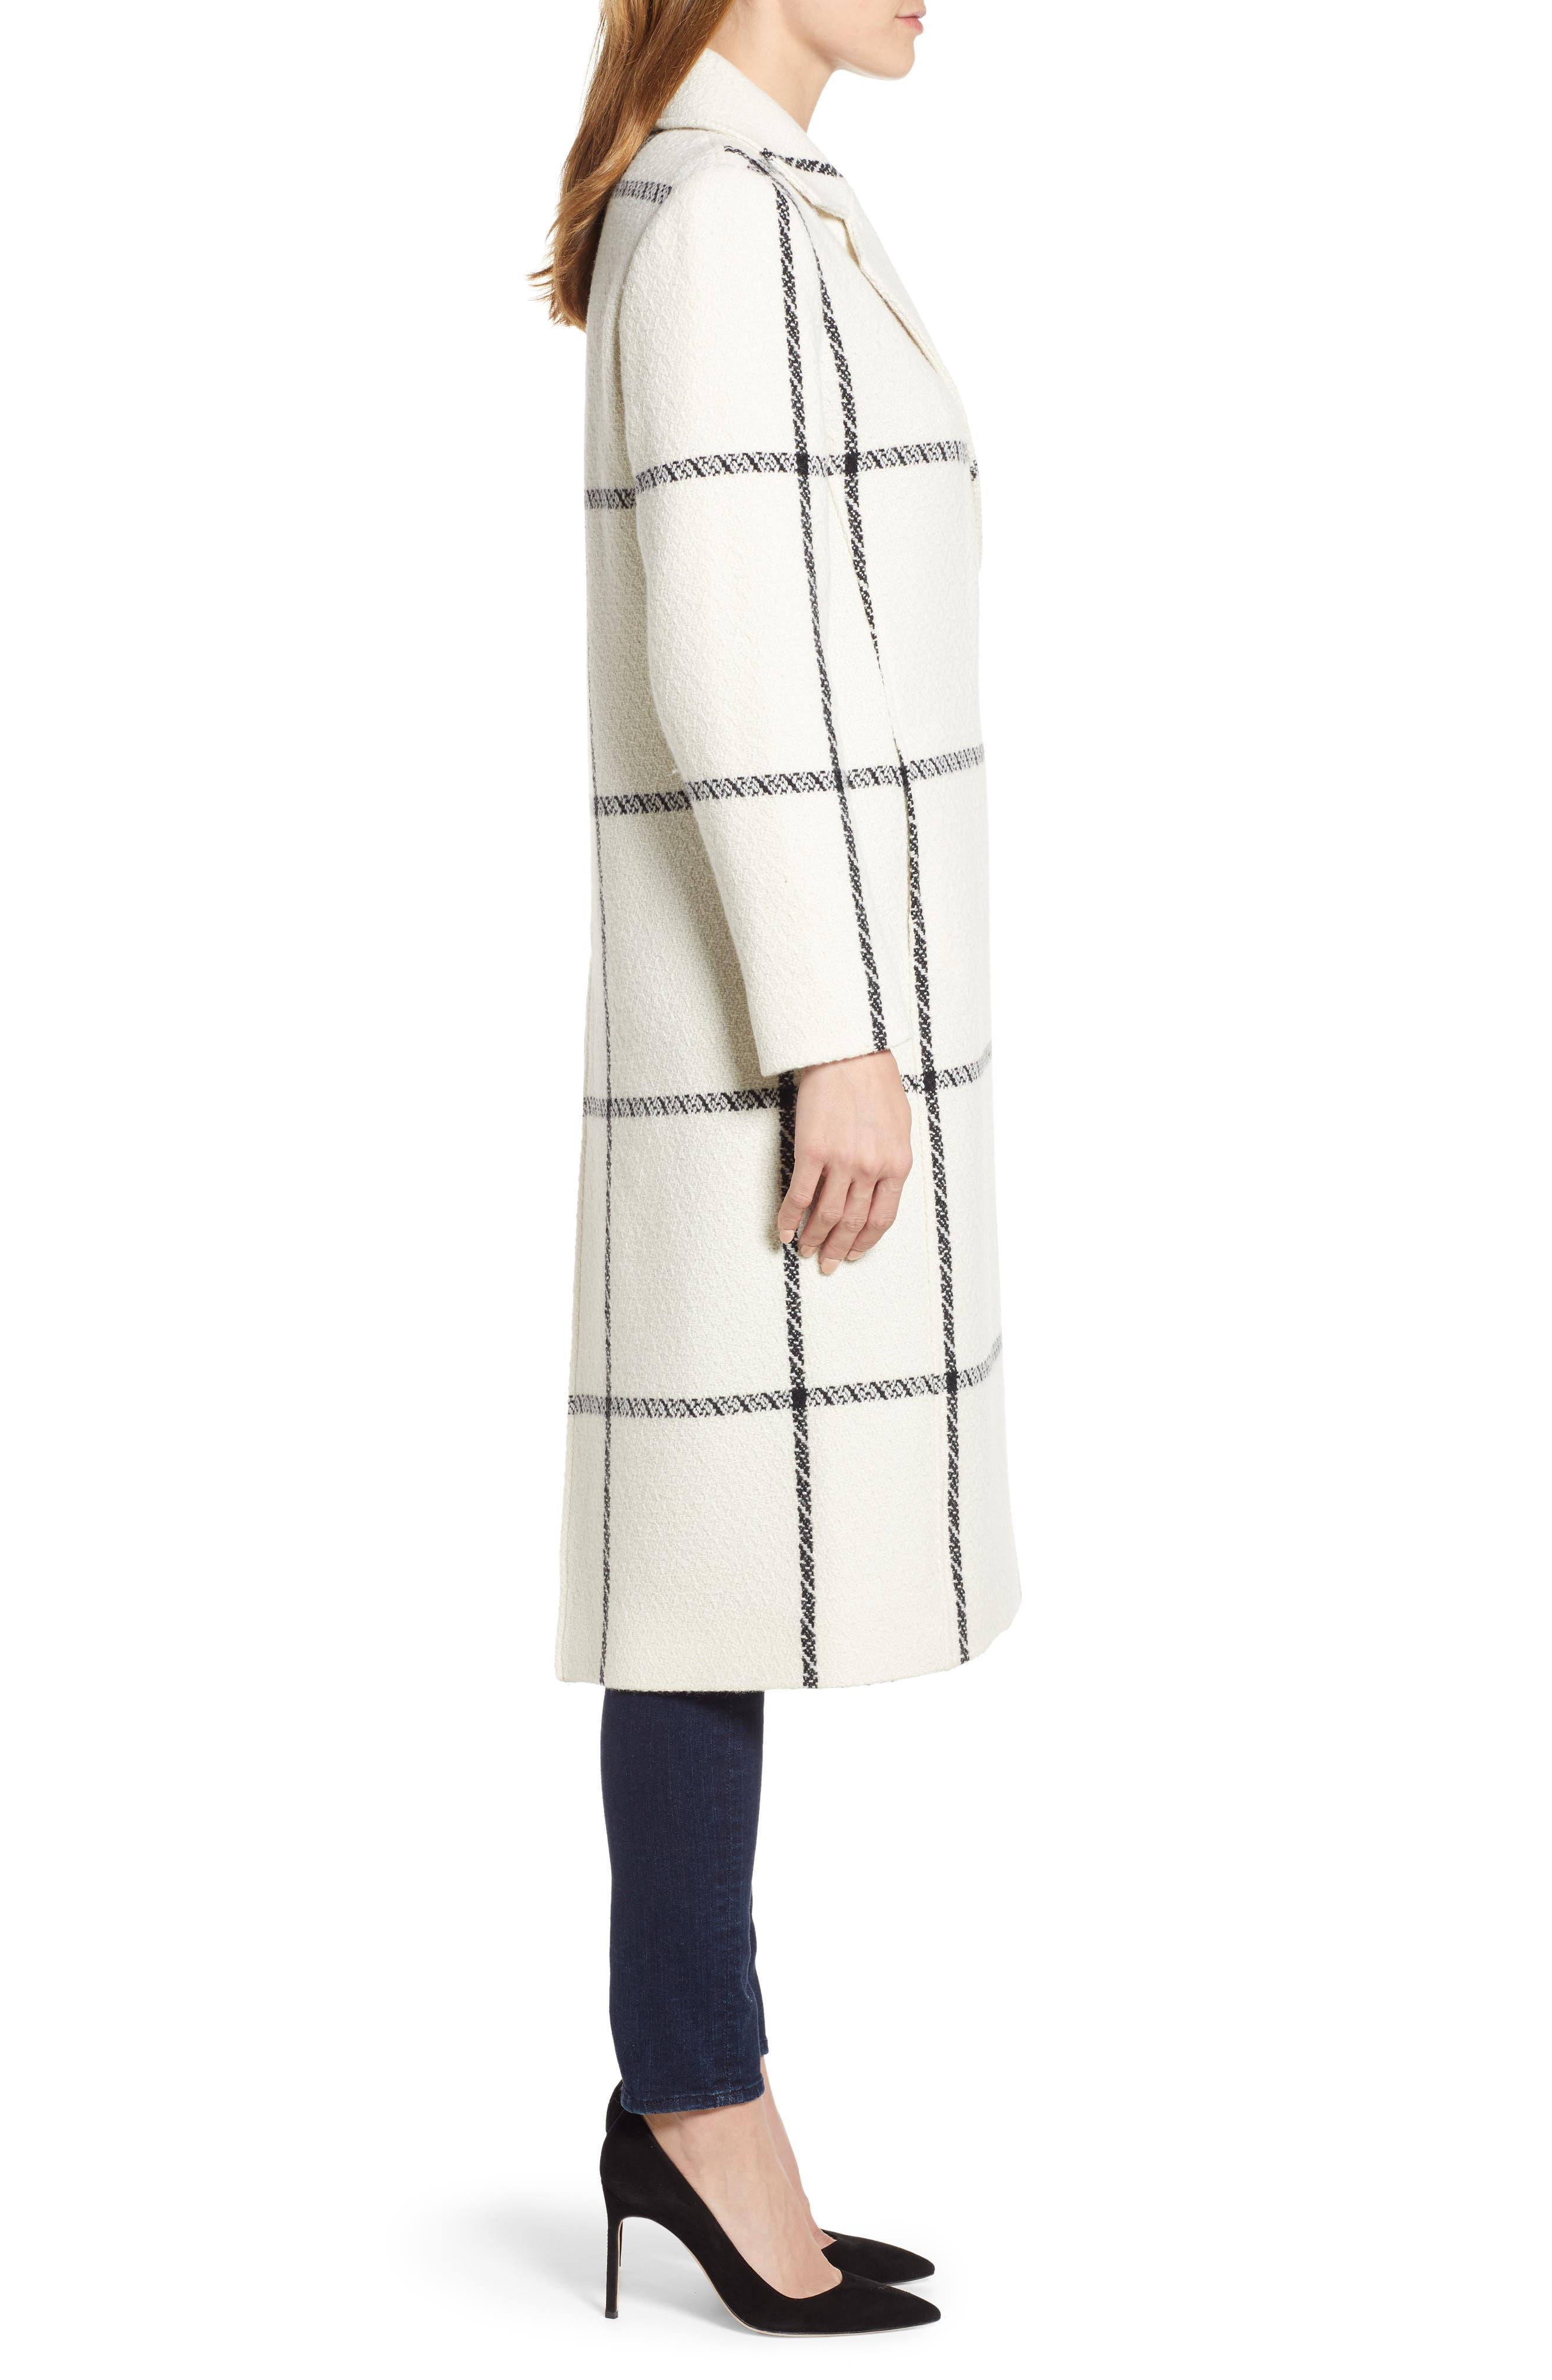 TED BAKER LONDON,                             Soniq Check Wool Blend Long Coat,                             Alternate thumbnail 4, color,                             92-IVORY